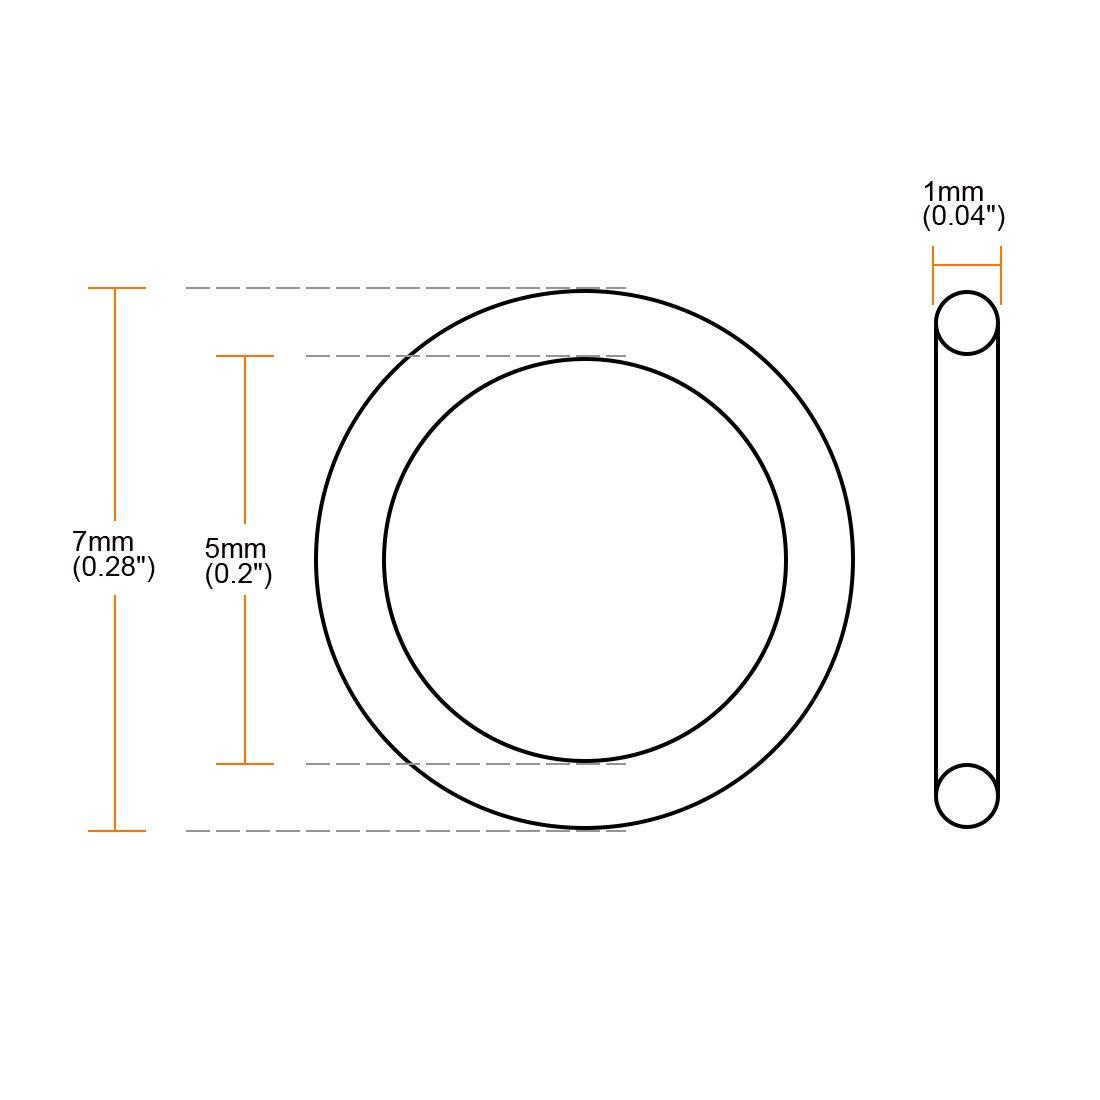 100 Elastic plugs 3x22 din1481 Goupilles élastiques pasadores Spring Pins